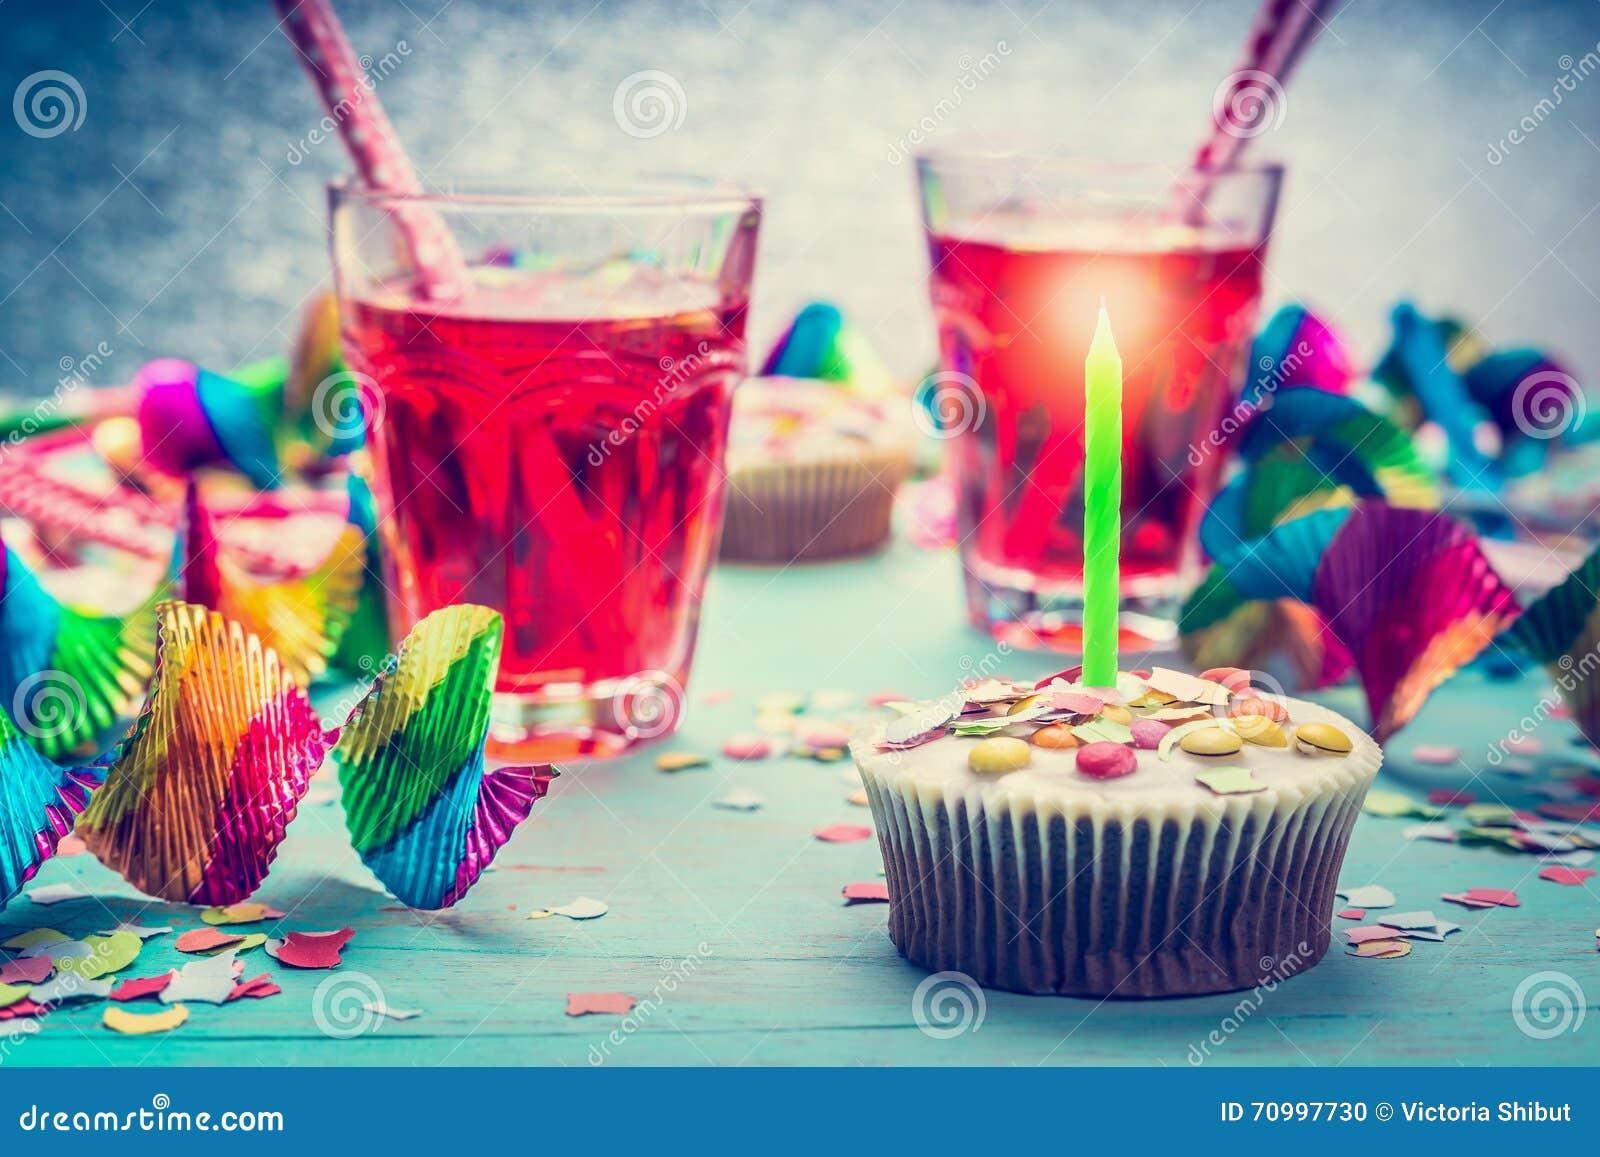 Happy Birthday Drink Cake